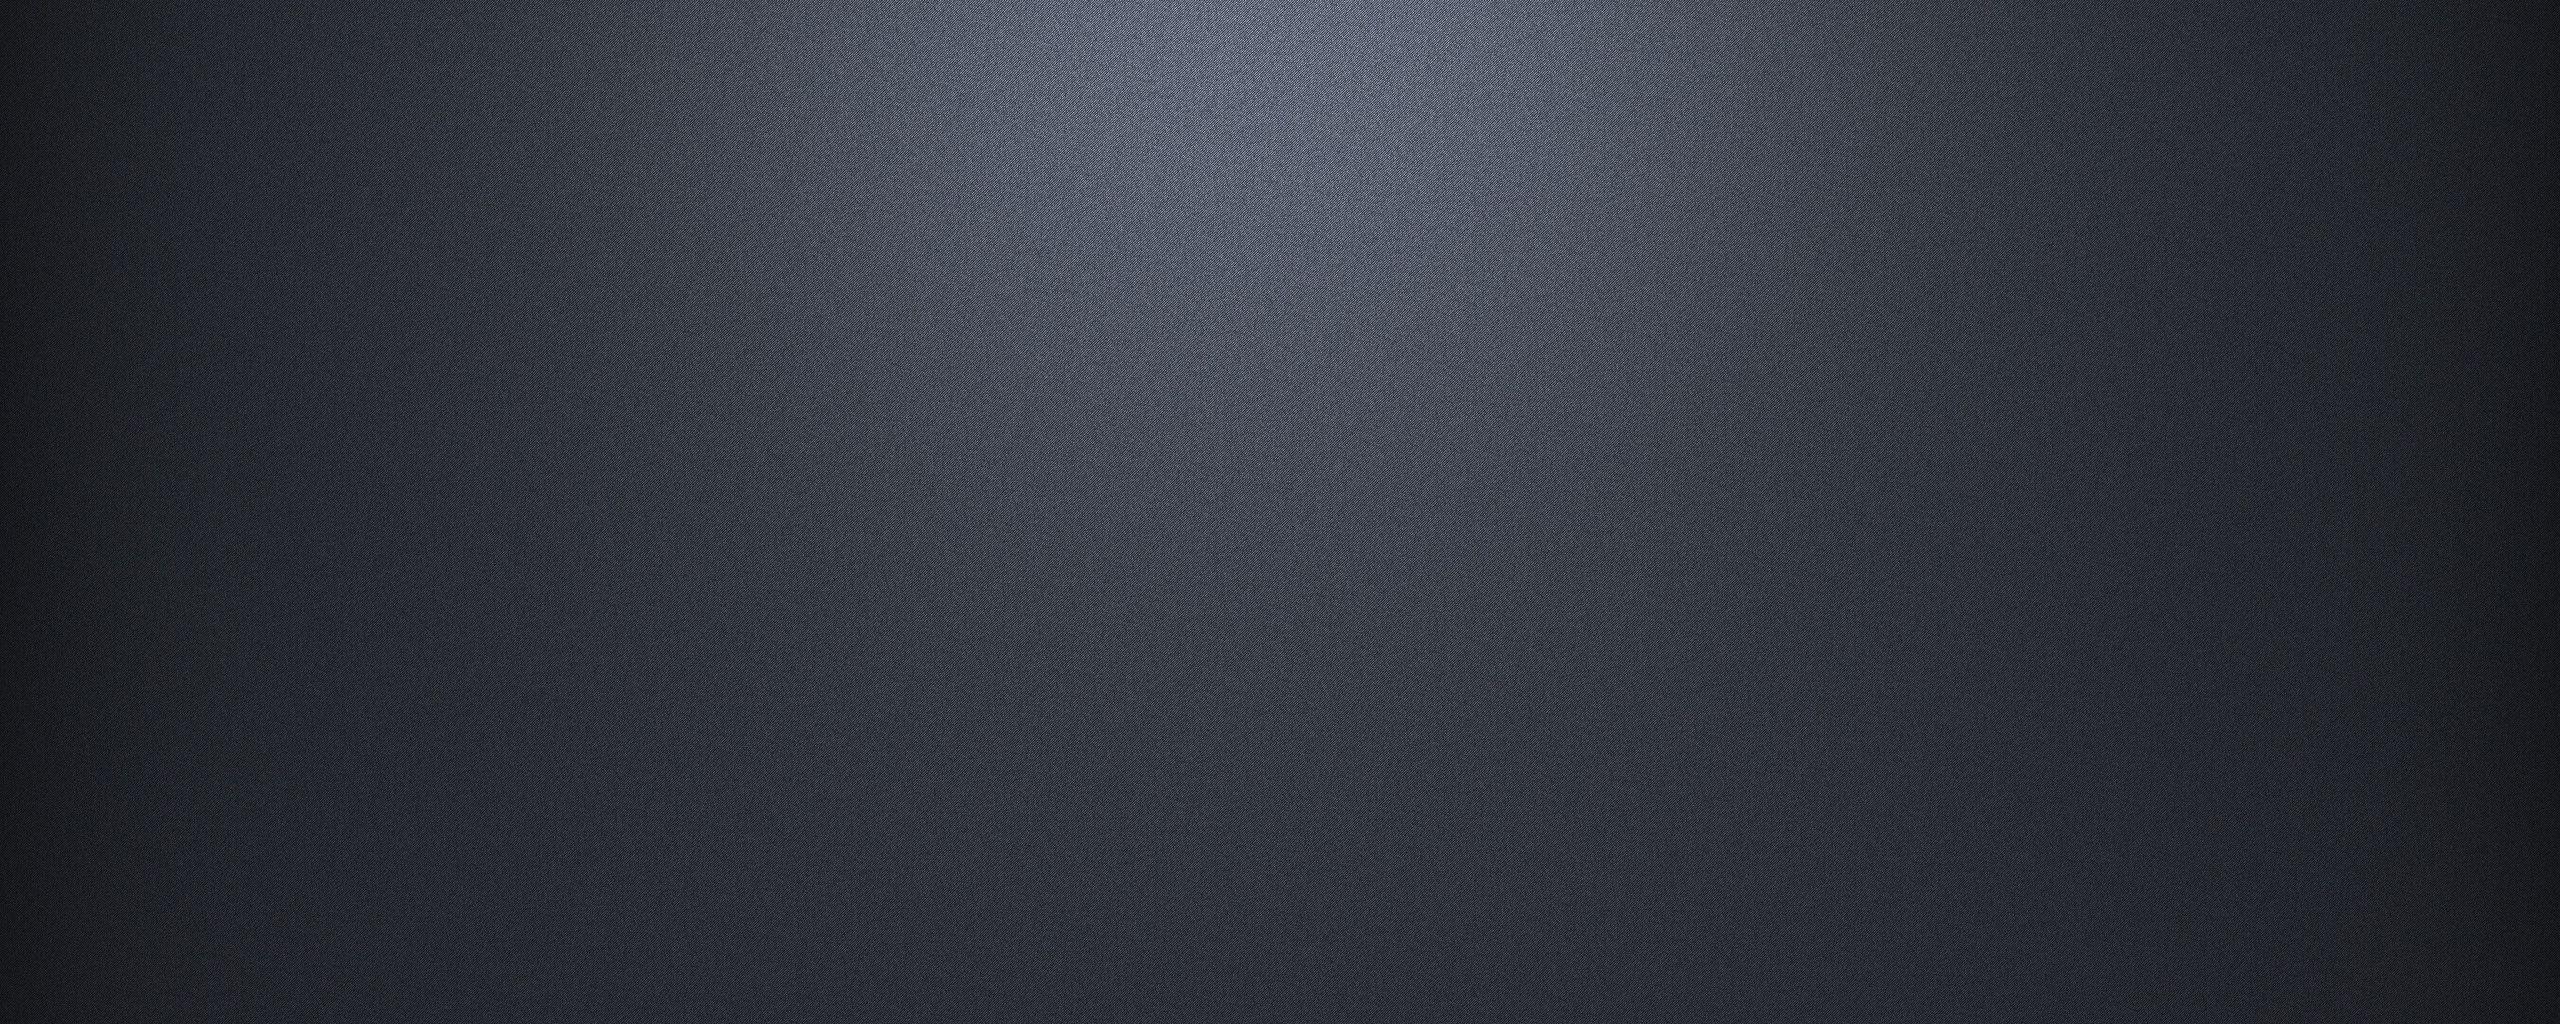 Dark Gray Wallpapers Group 63